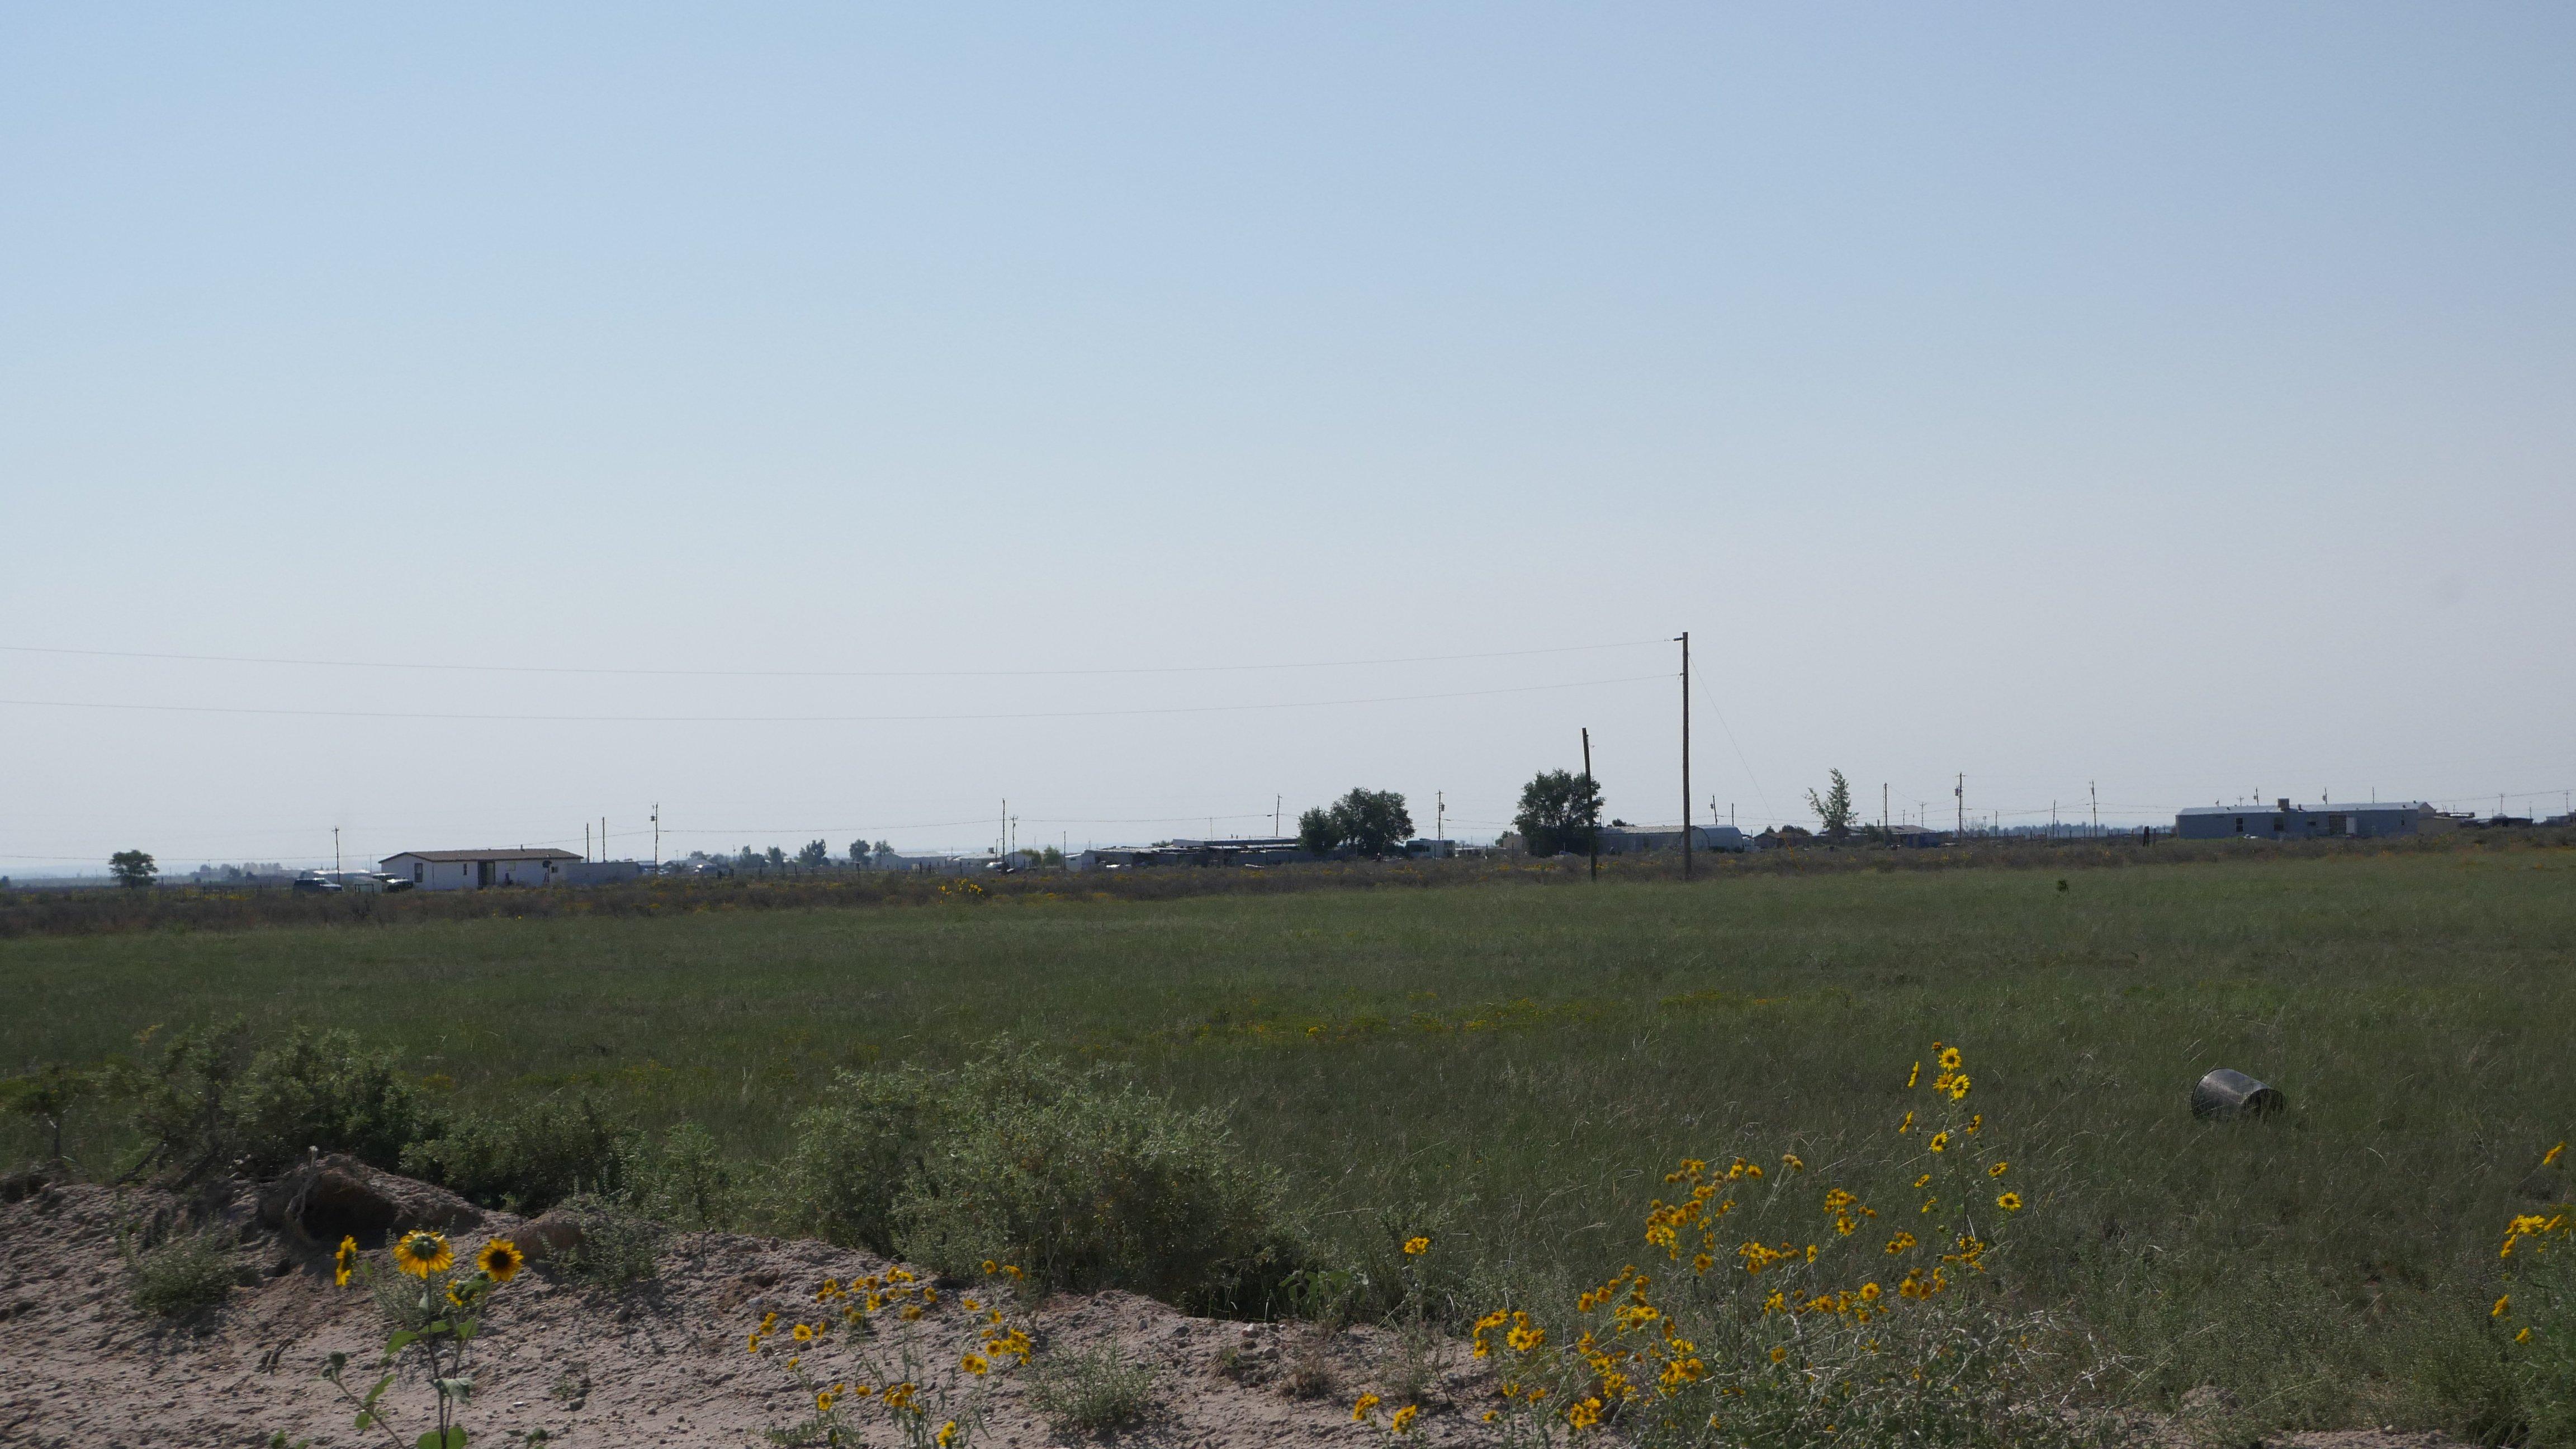 CH098ERG Torrance Co, NM